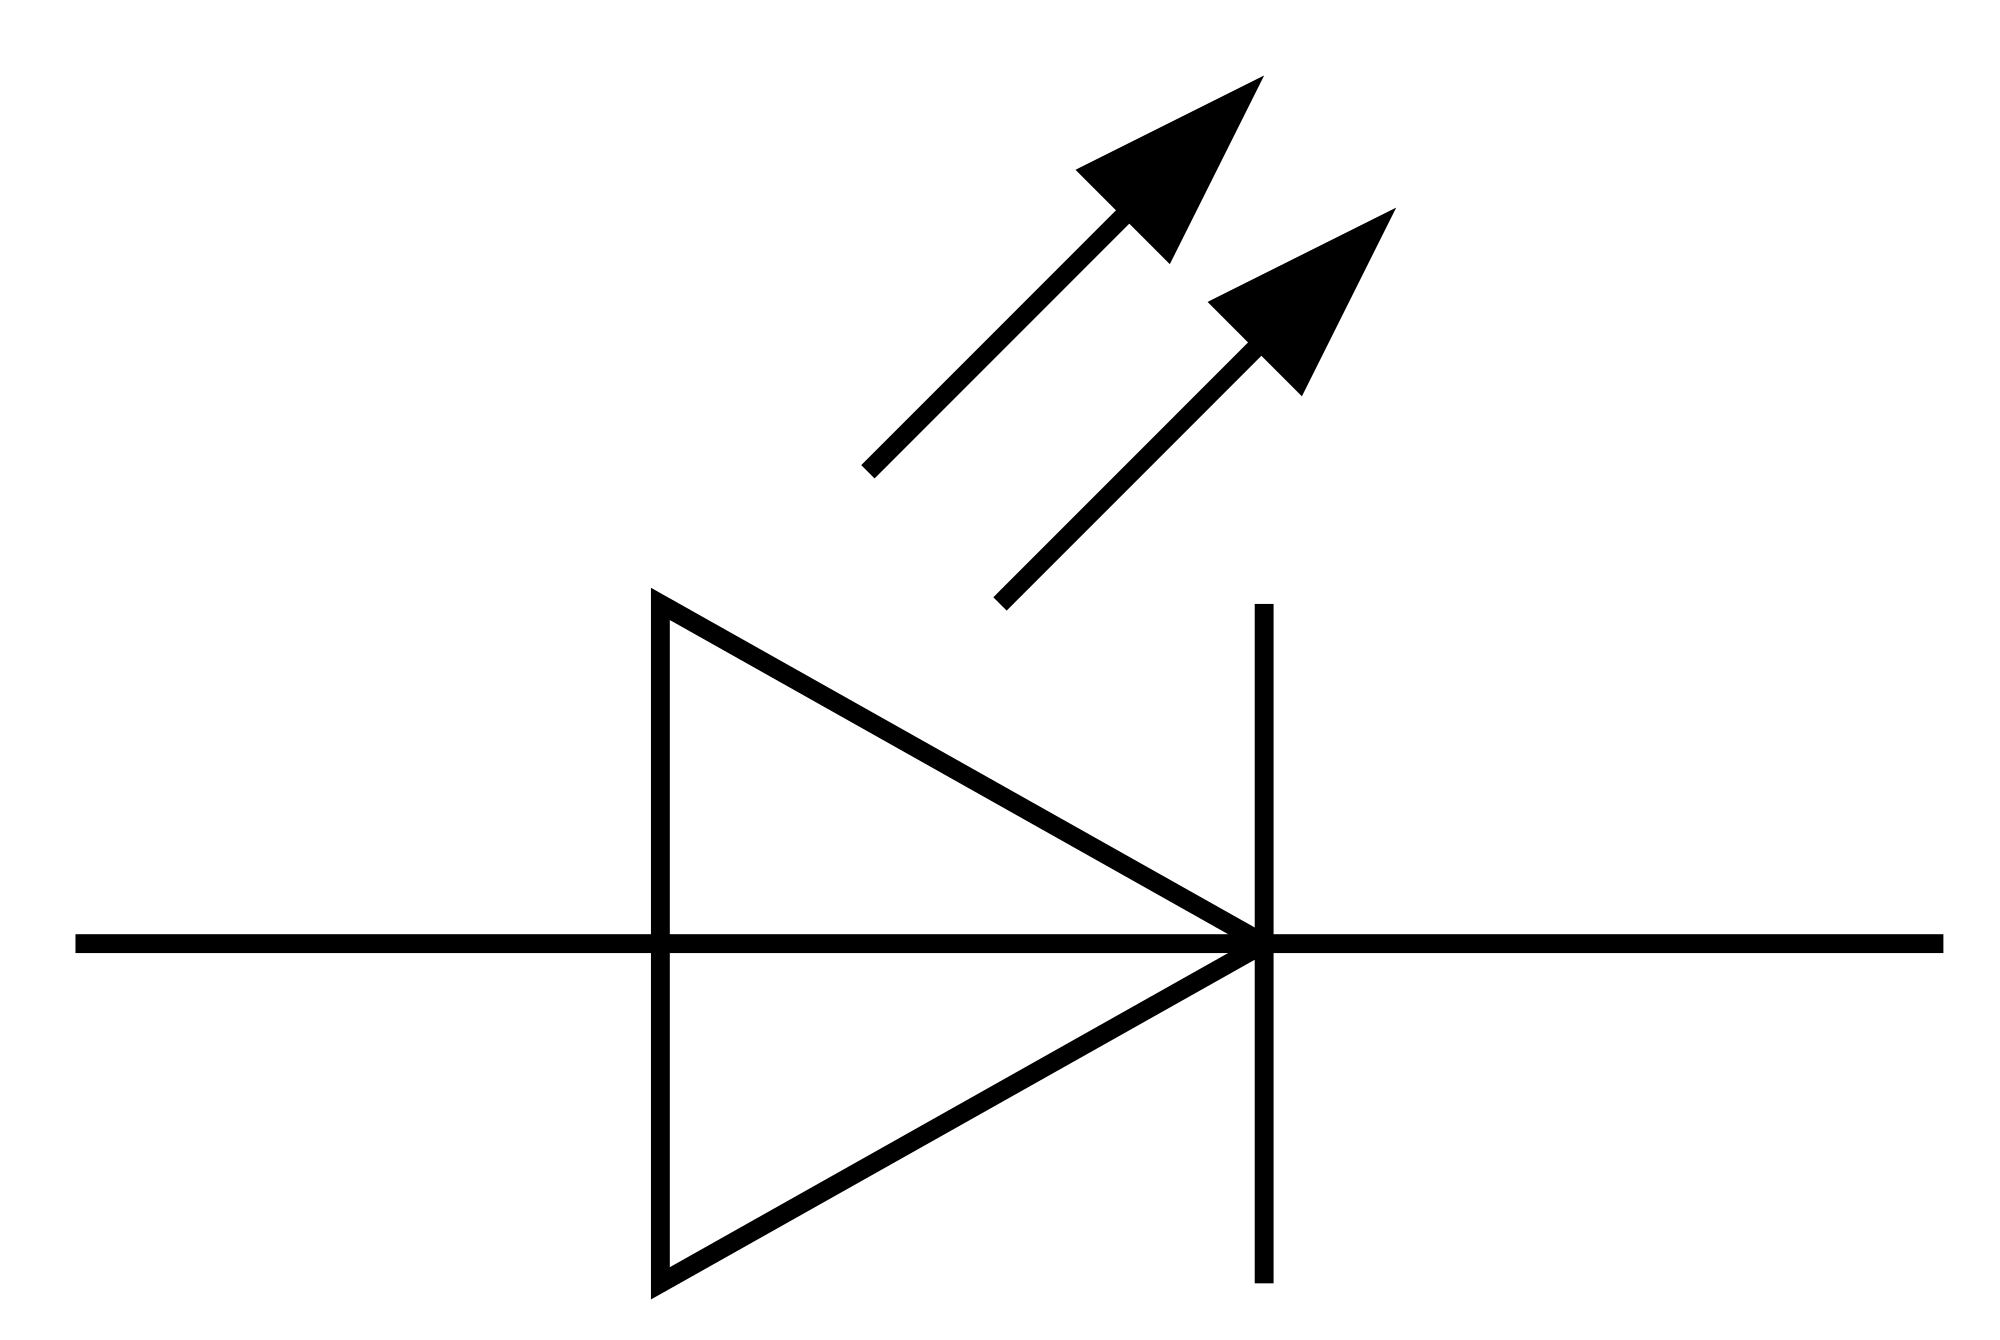 the led circuit diagram symbol